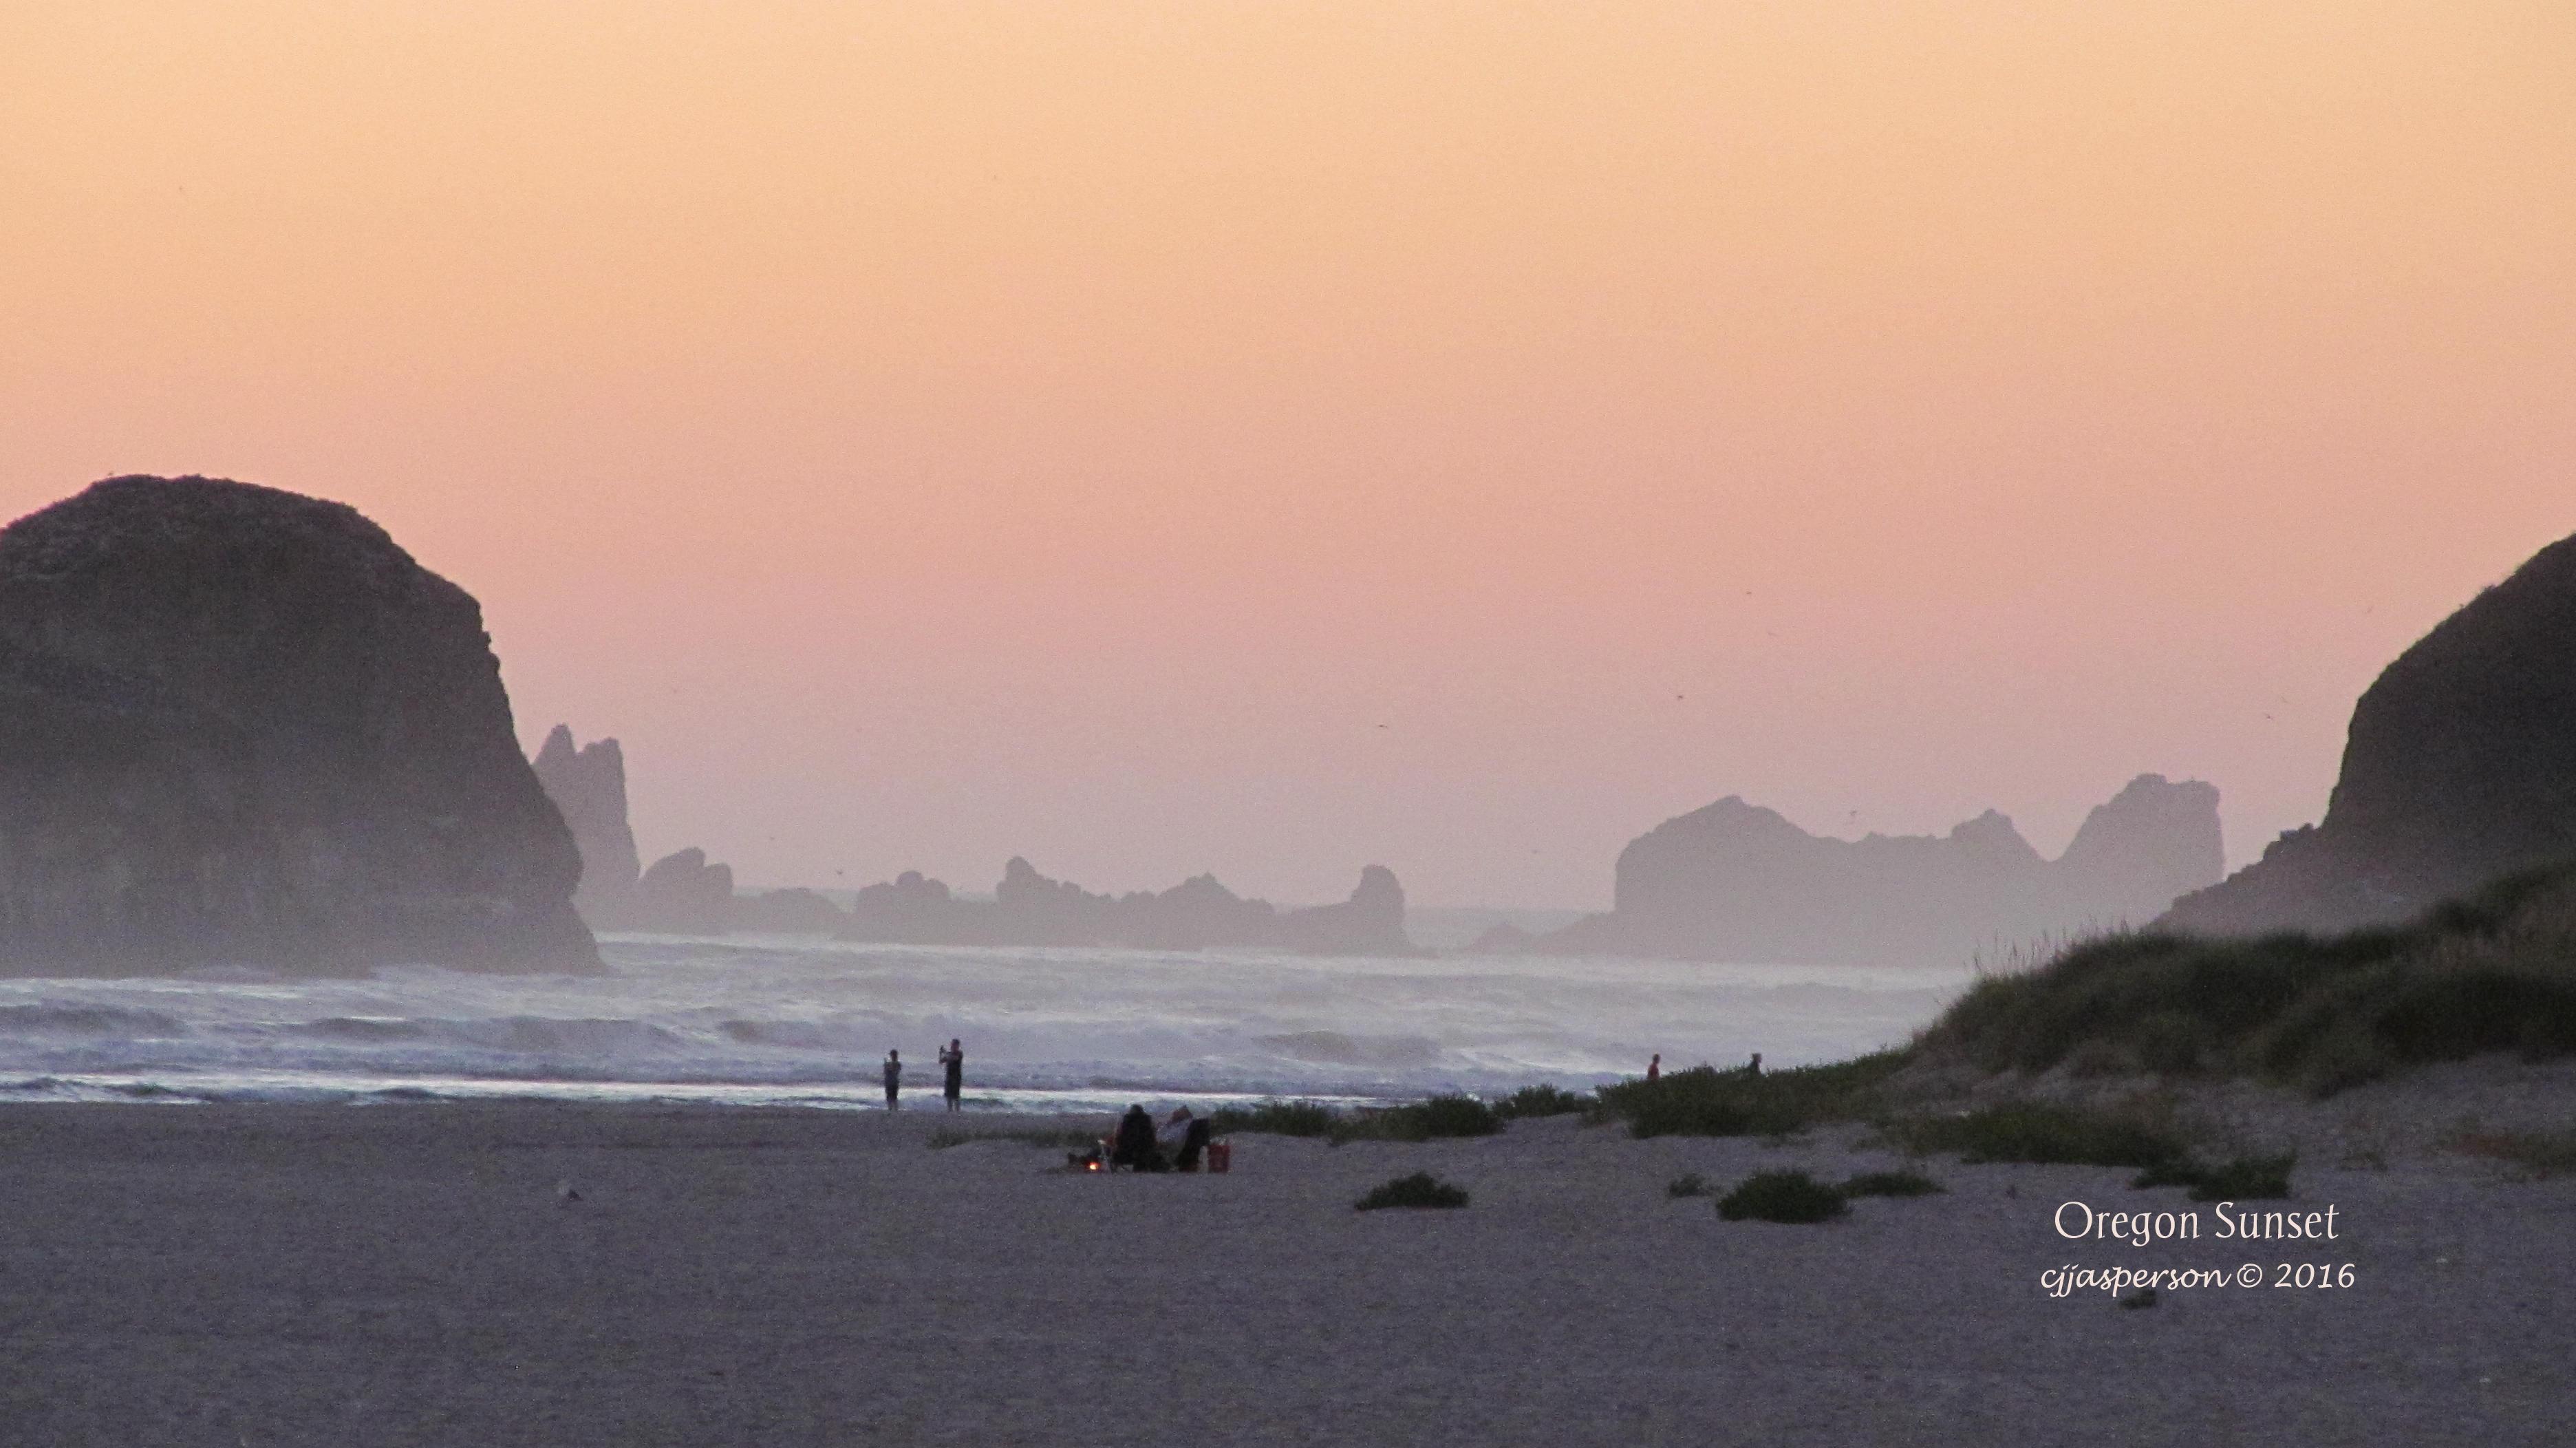 Oregon Sunset Taken August 12, 2016 CJJasperson